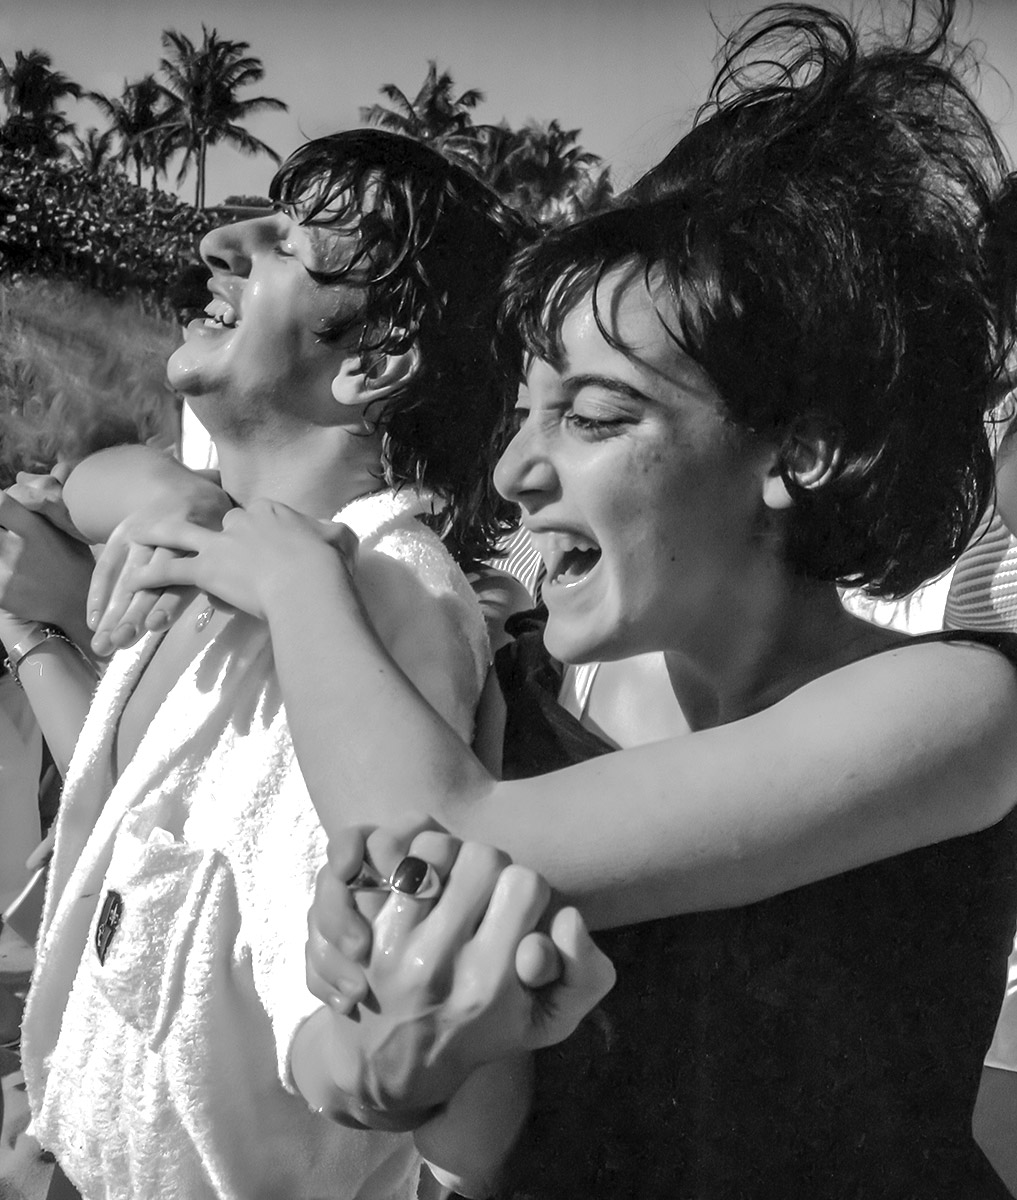 Ringo gets a hug by the pool, Miami, Florida, February 1964.